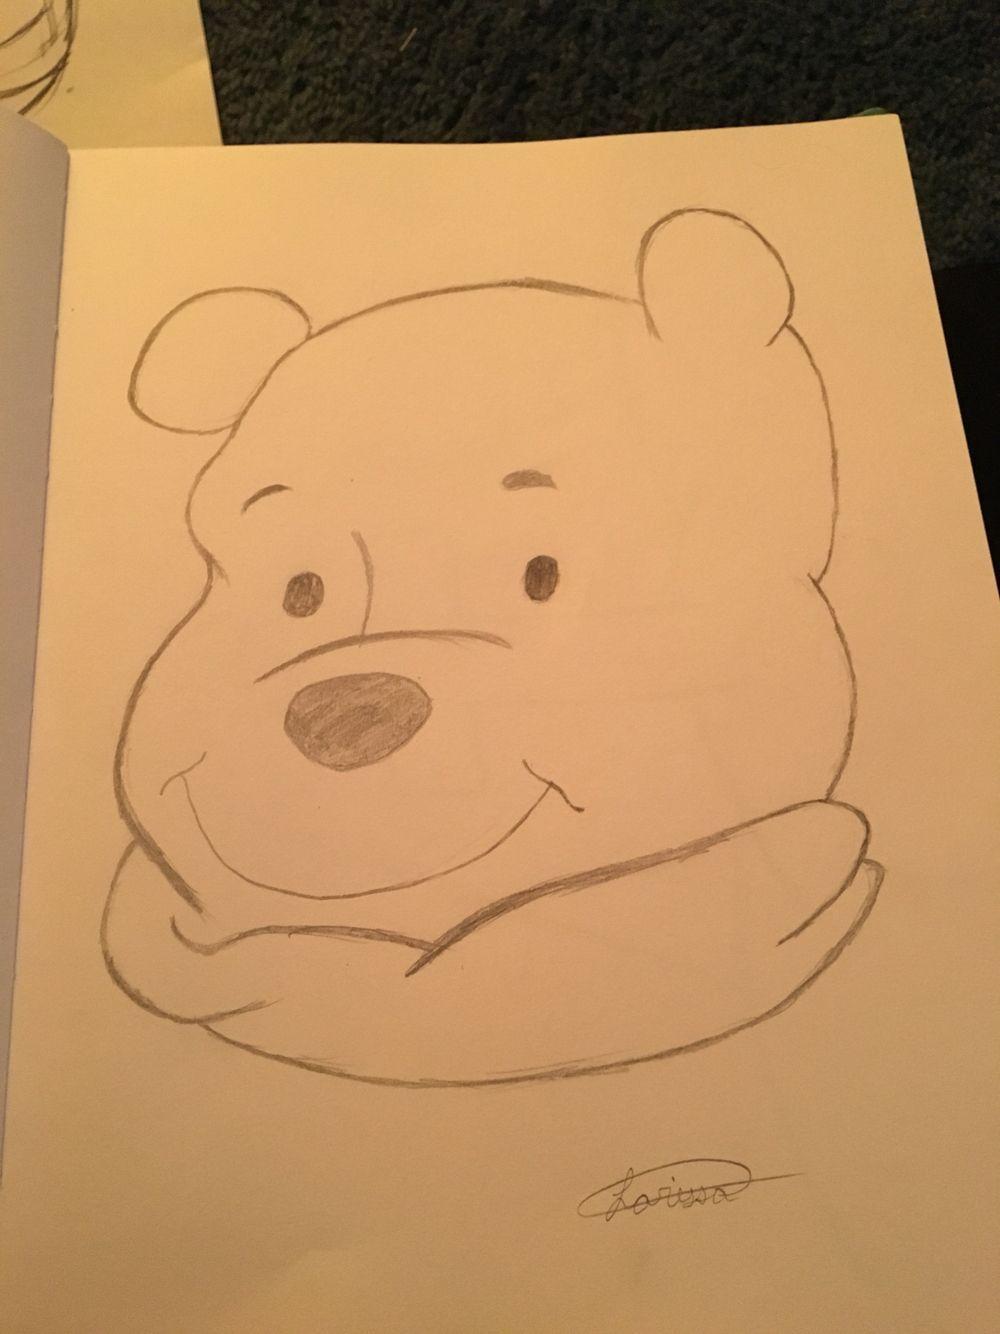 Its winner the poo drawings pinterest drawings its winner the poo voltagebd Choice Image